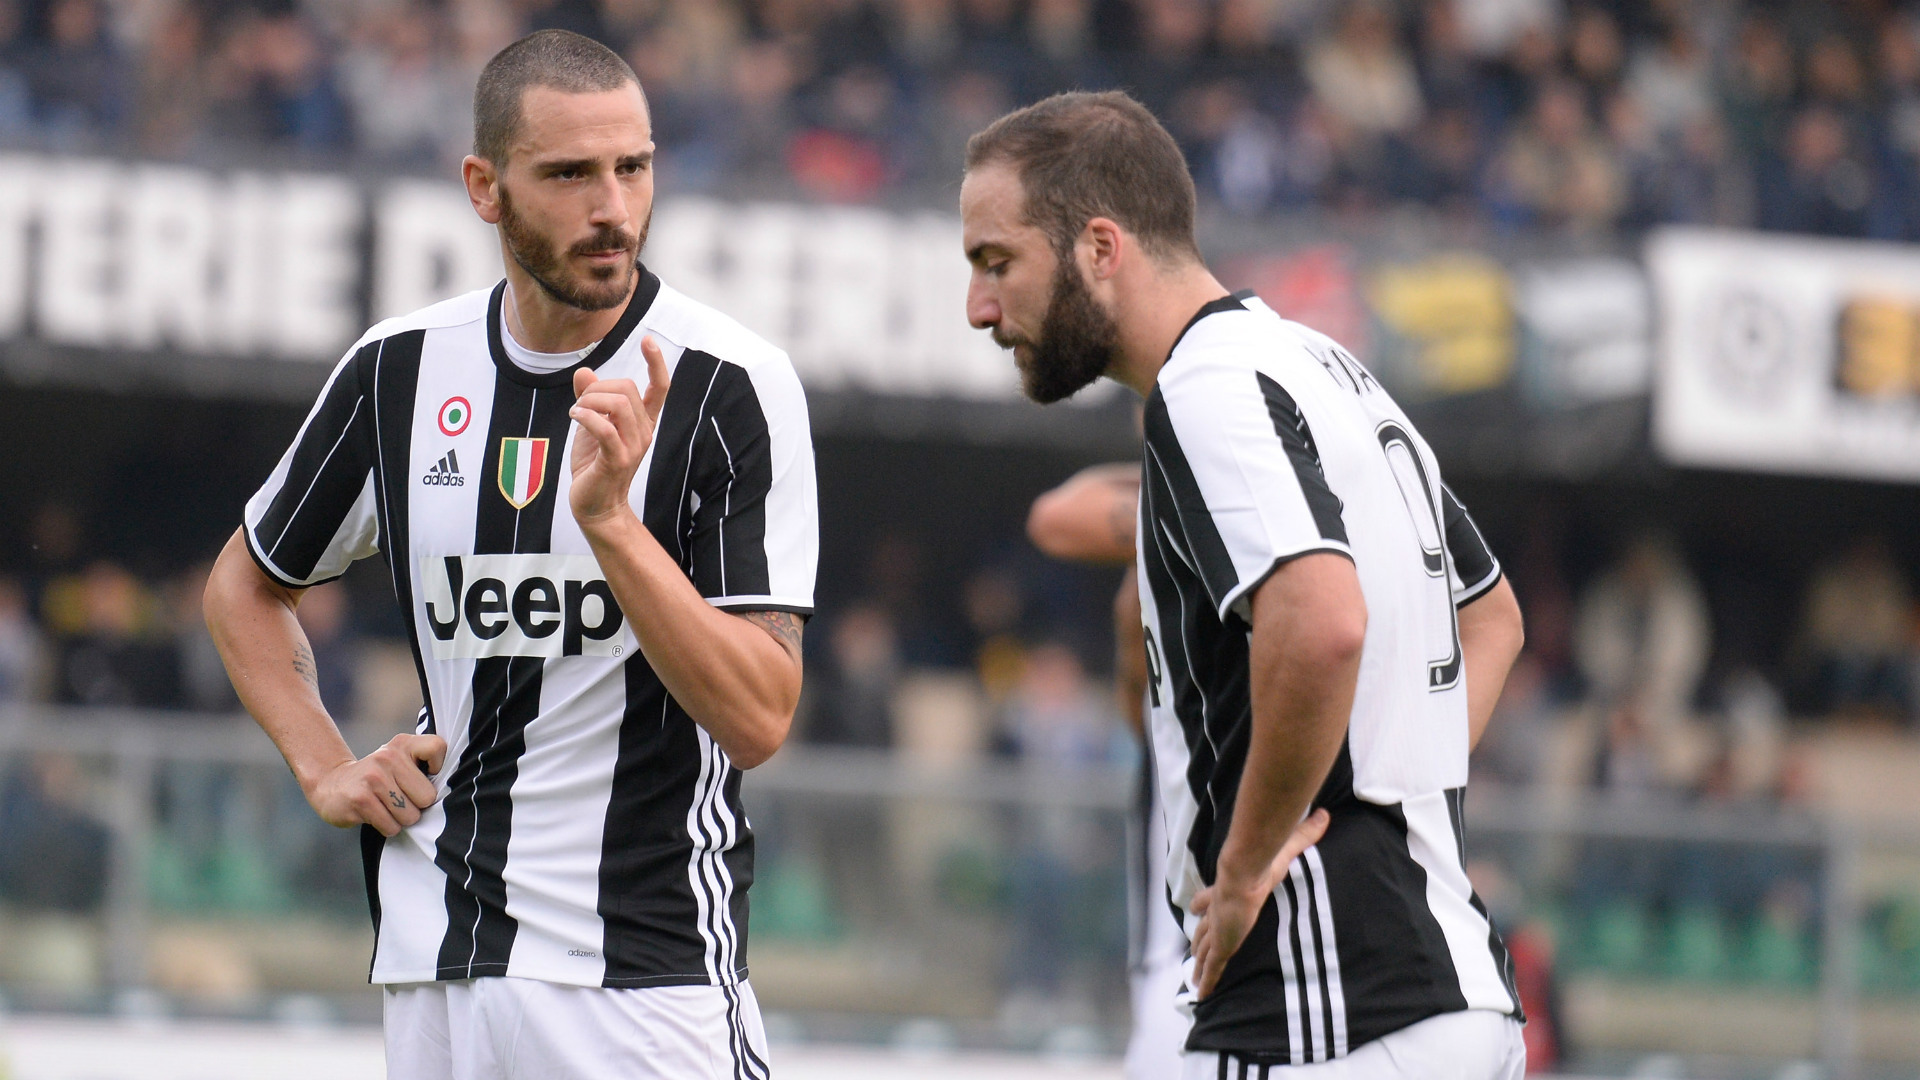 Leonardo Bonucci Gonzalo Higuain Juventus 2016-17